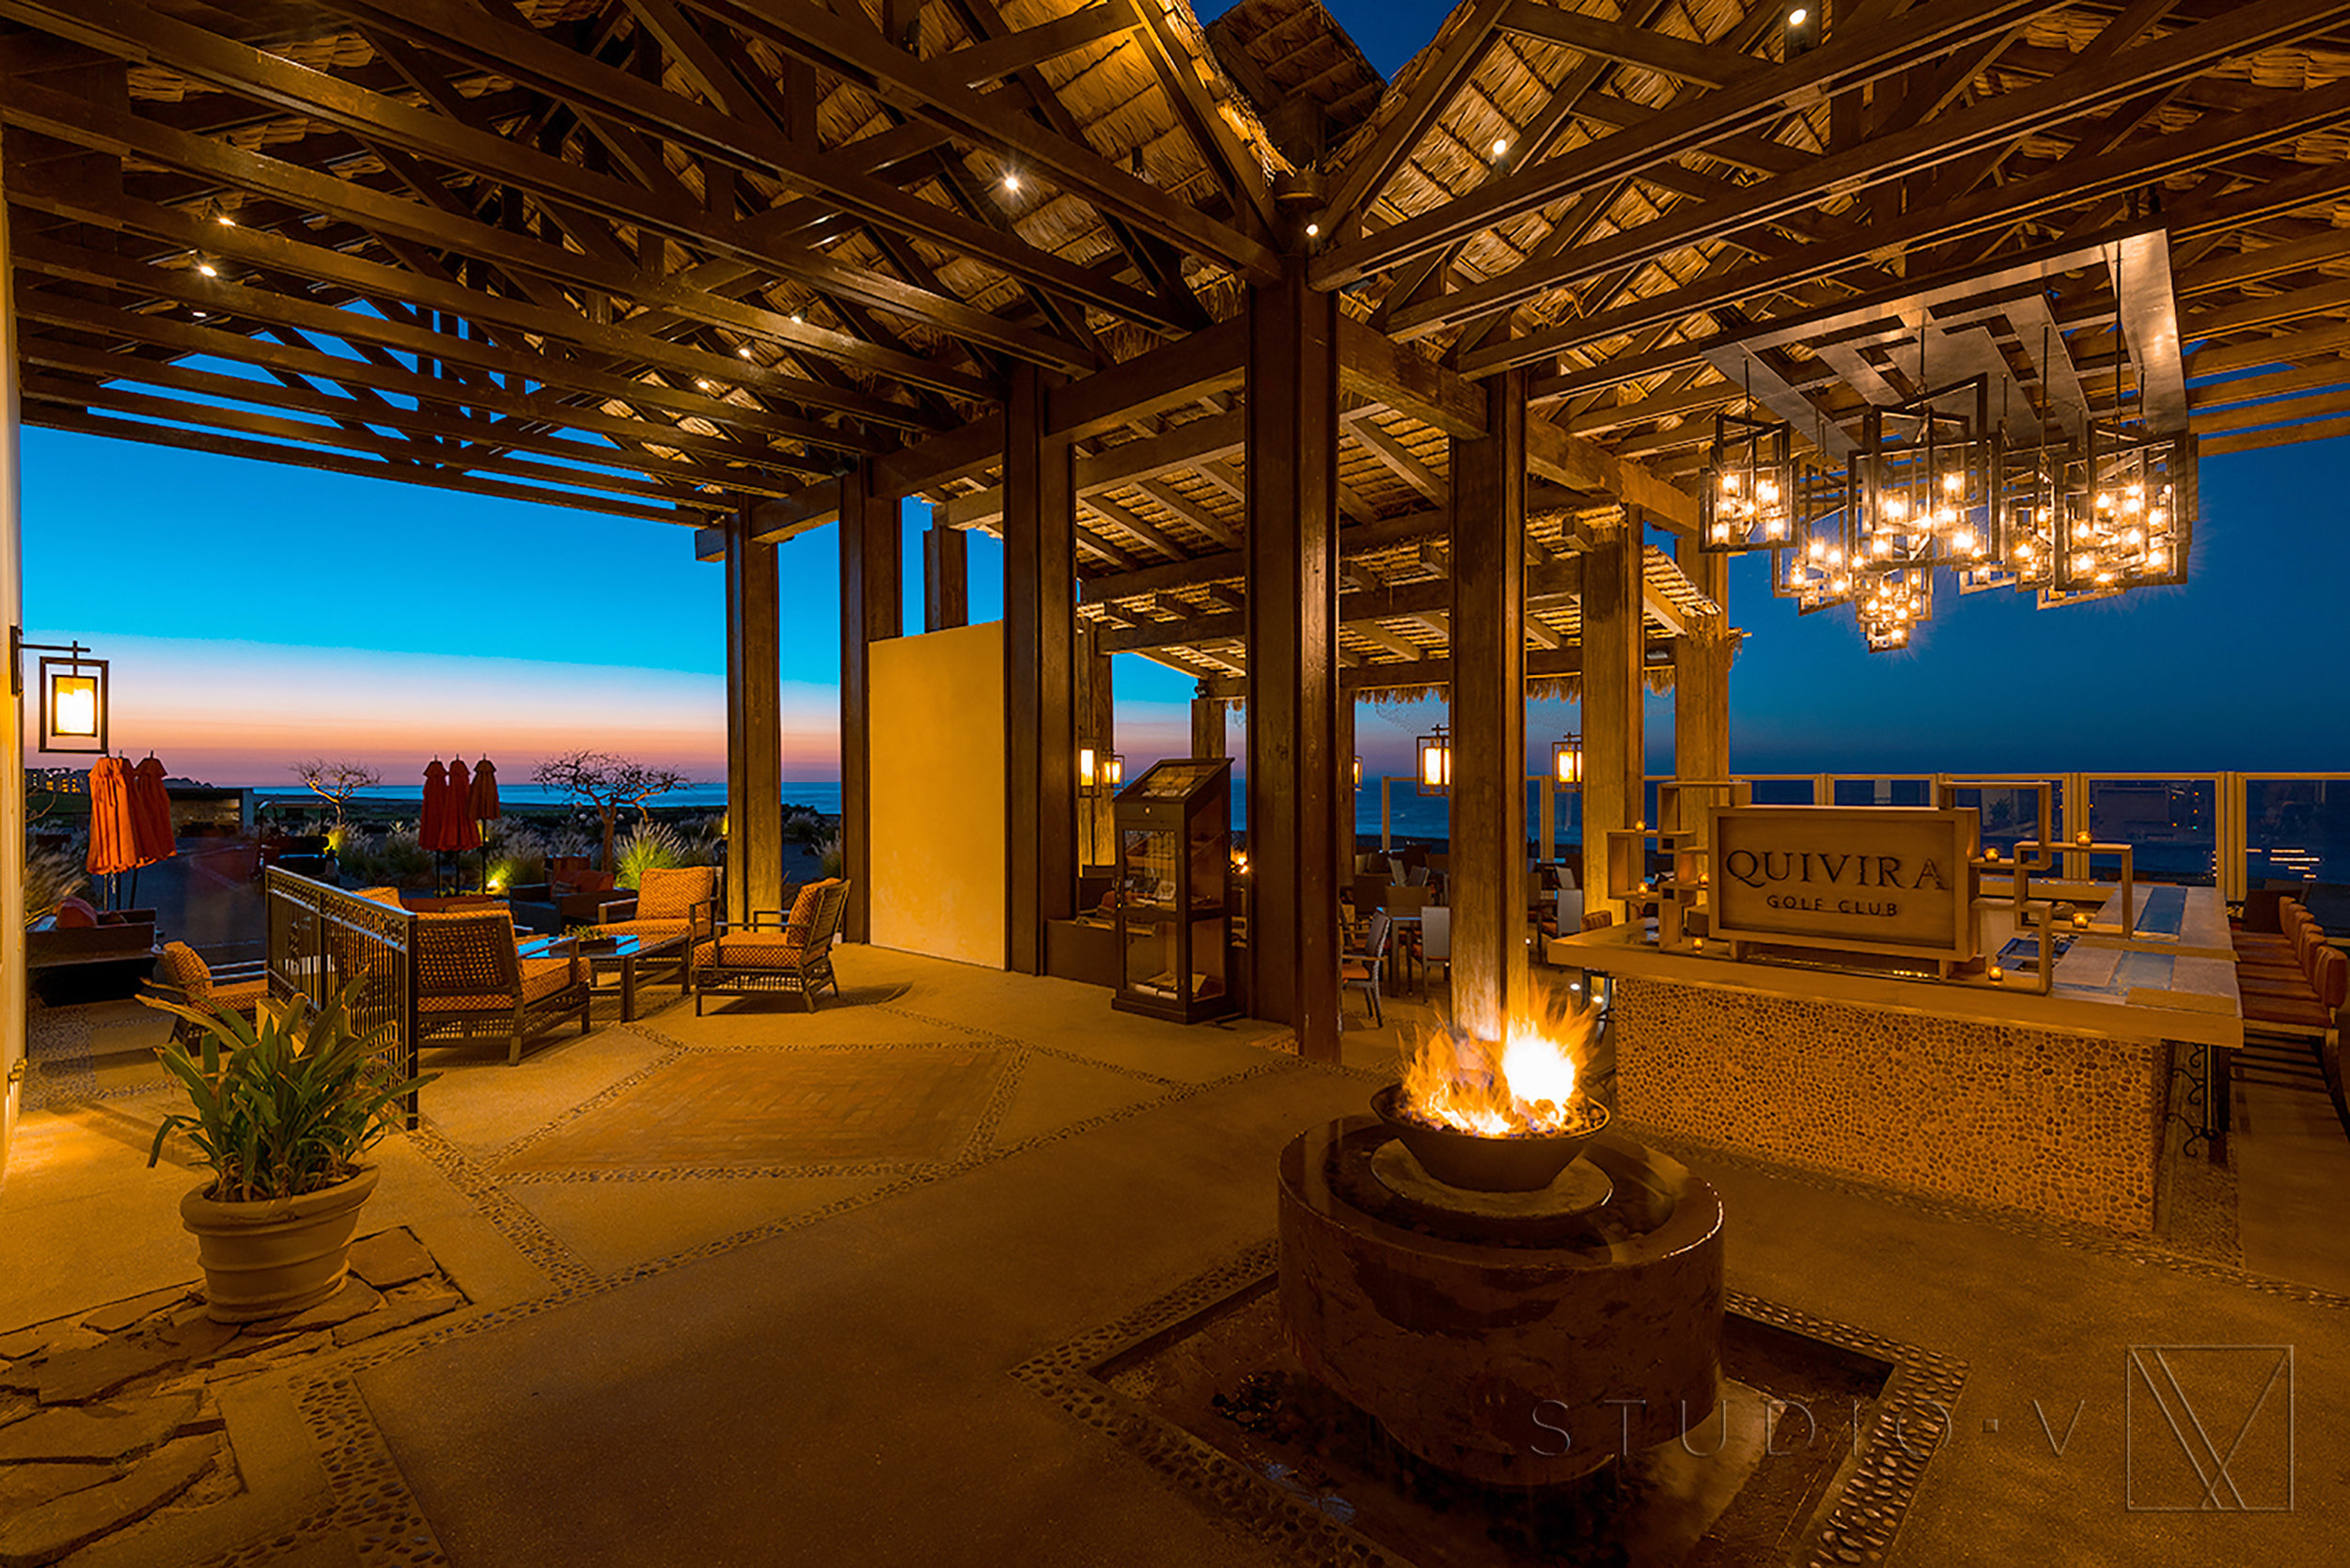 Quivira Clubhouse Sunset Beach Cabo San Lucas Studio V Interior Architecture and Design Scottsdale Arizona AZ (1).jpg